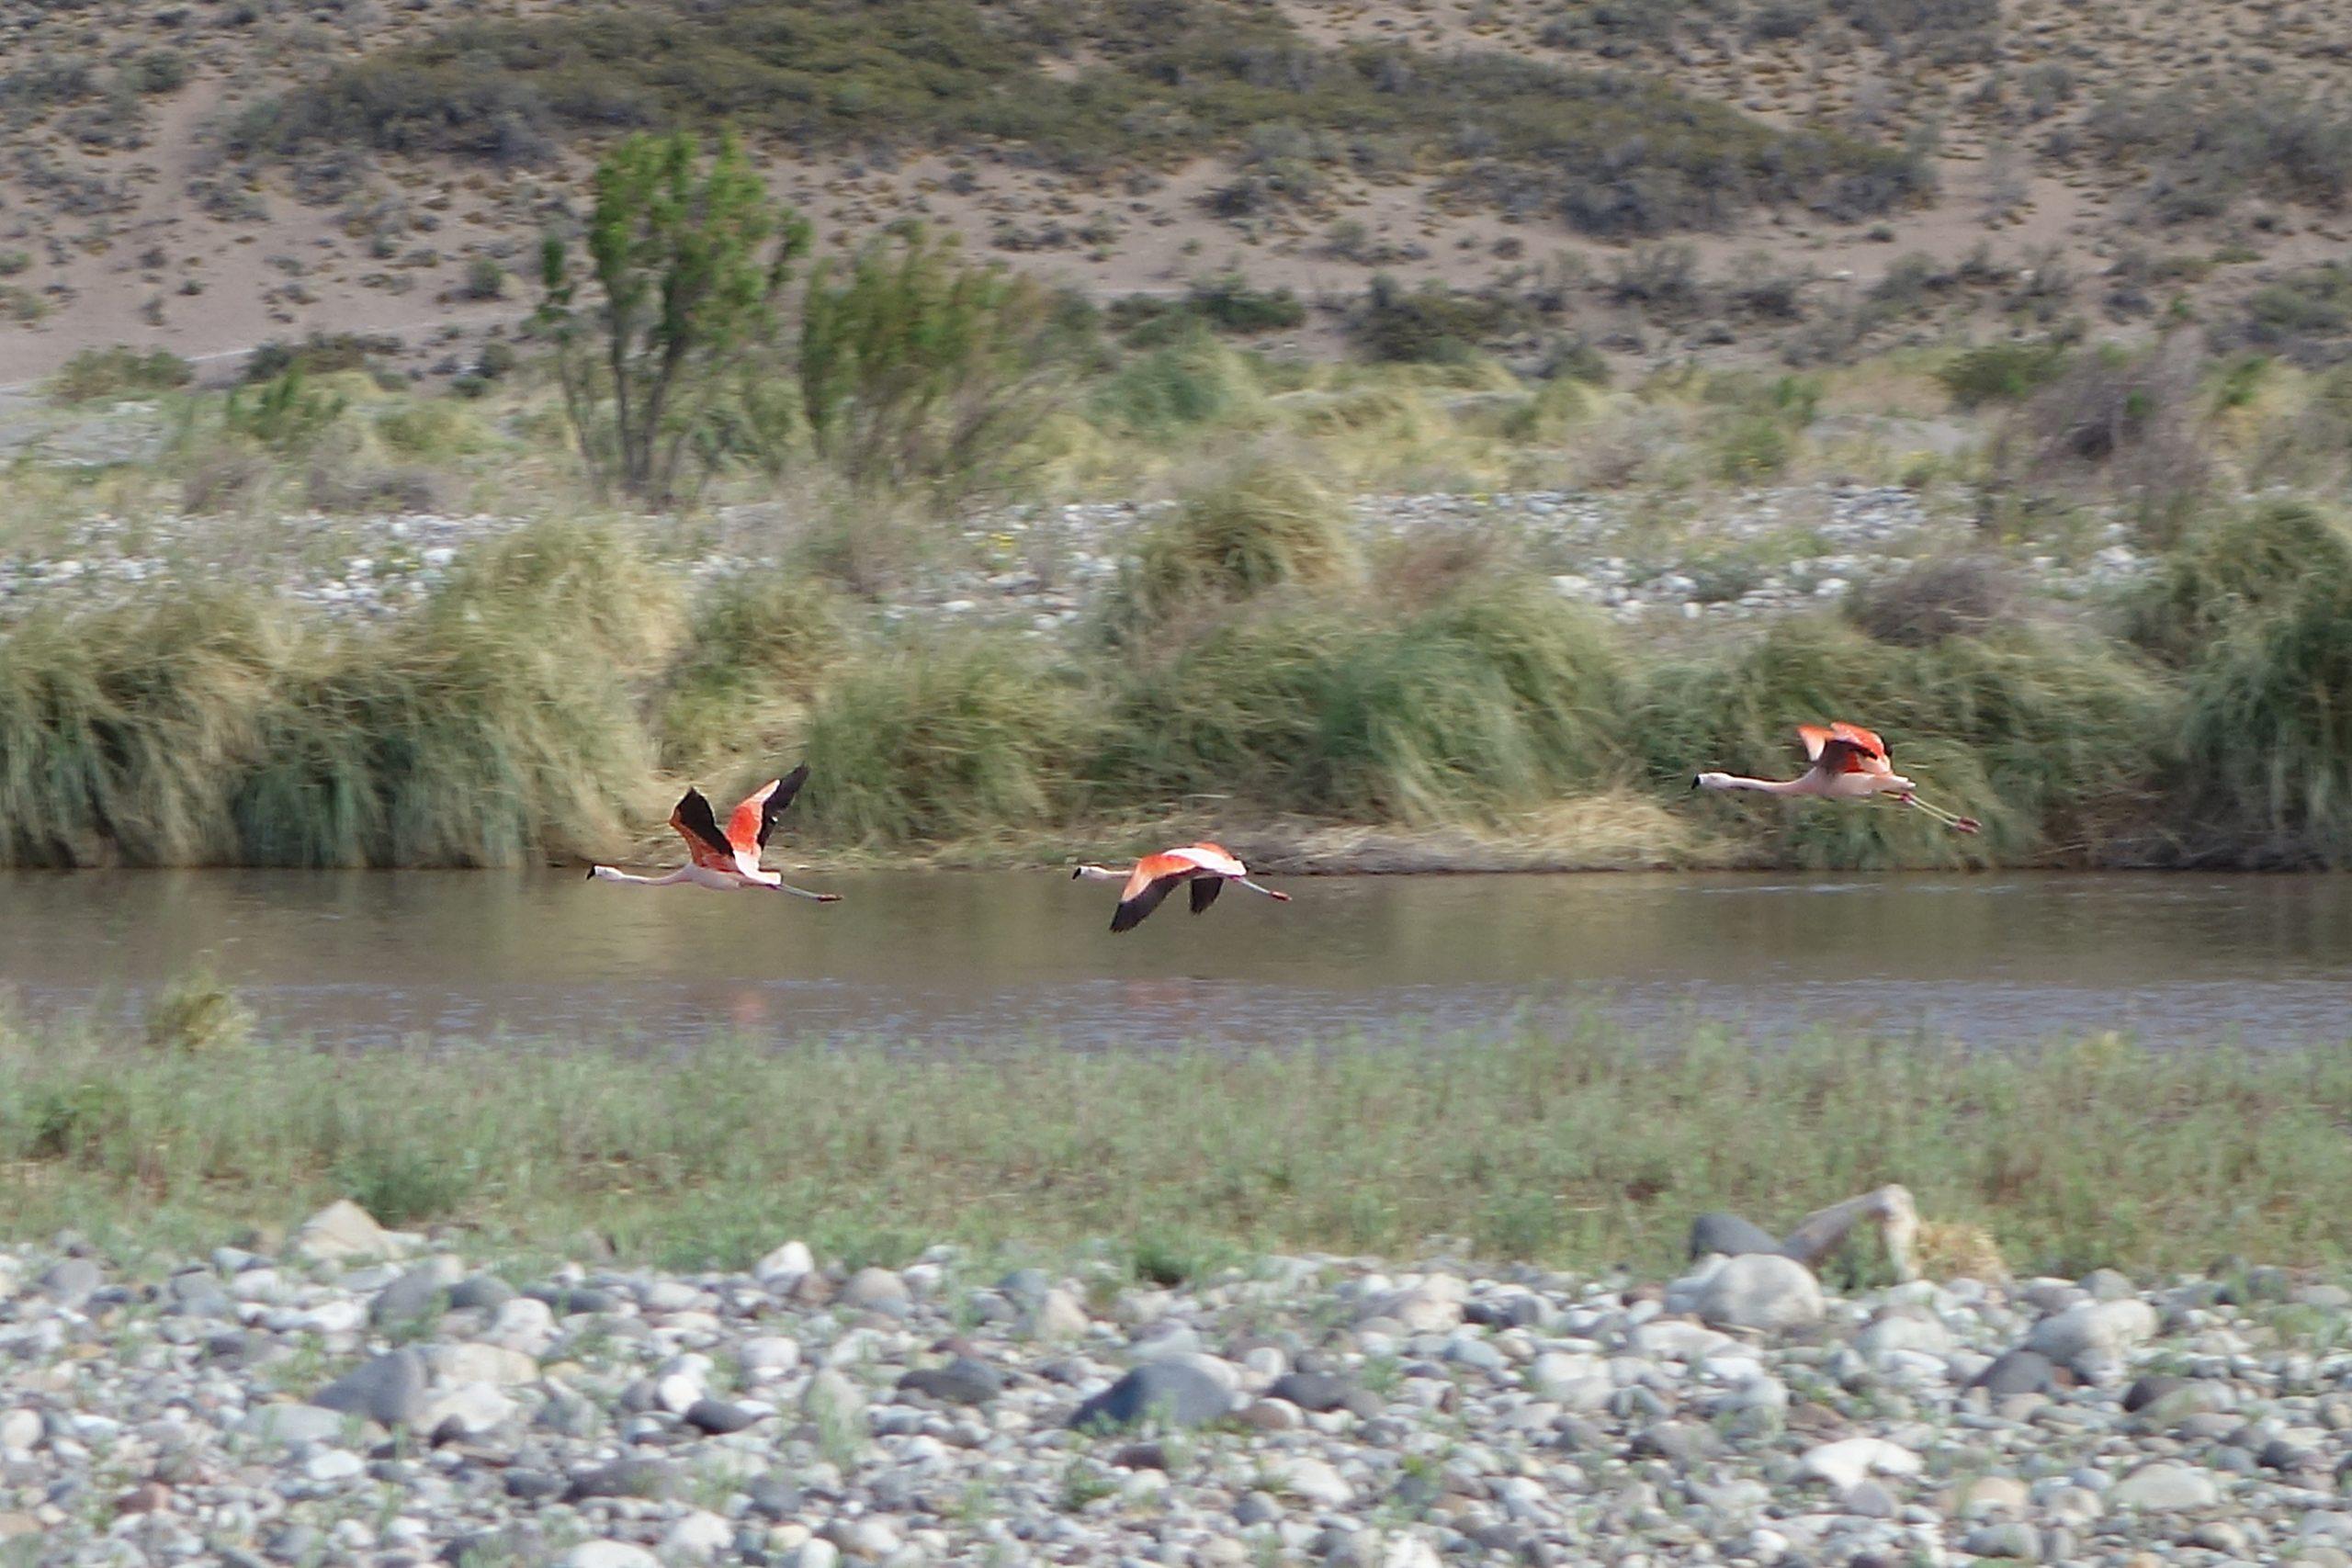 Radreise Südamerika 2019 - Flamingos am Rio Grande